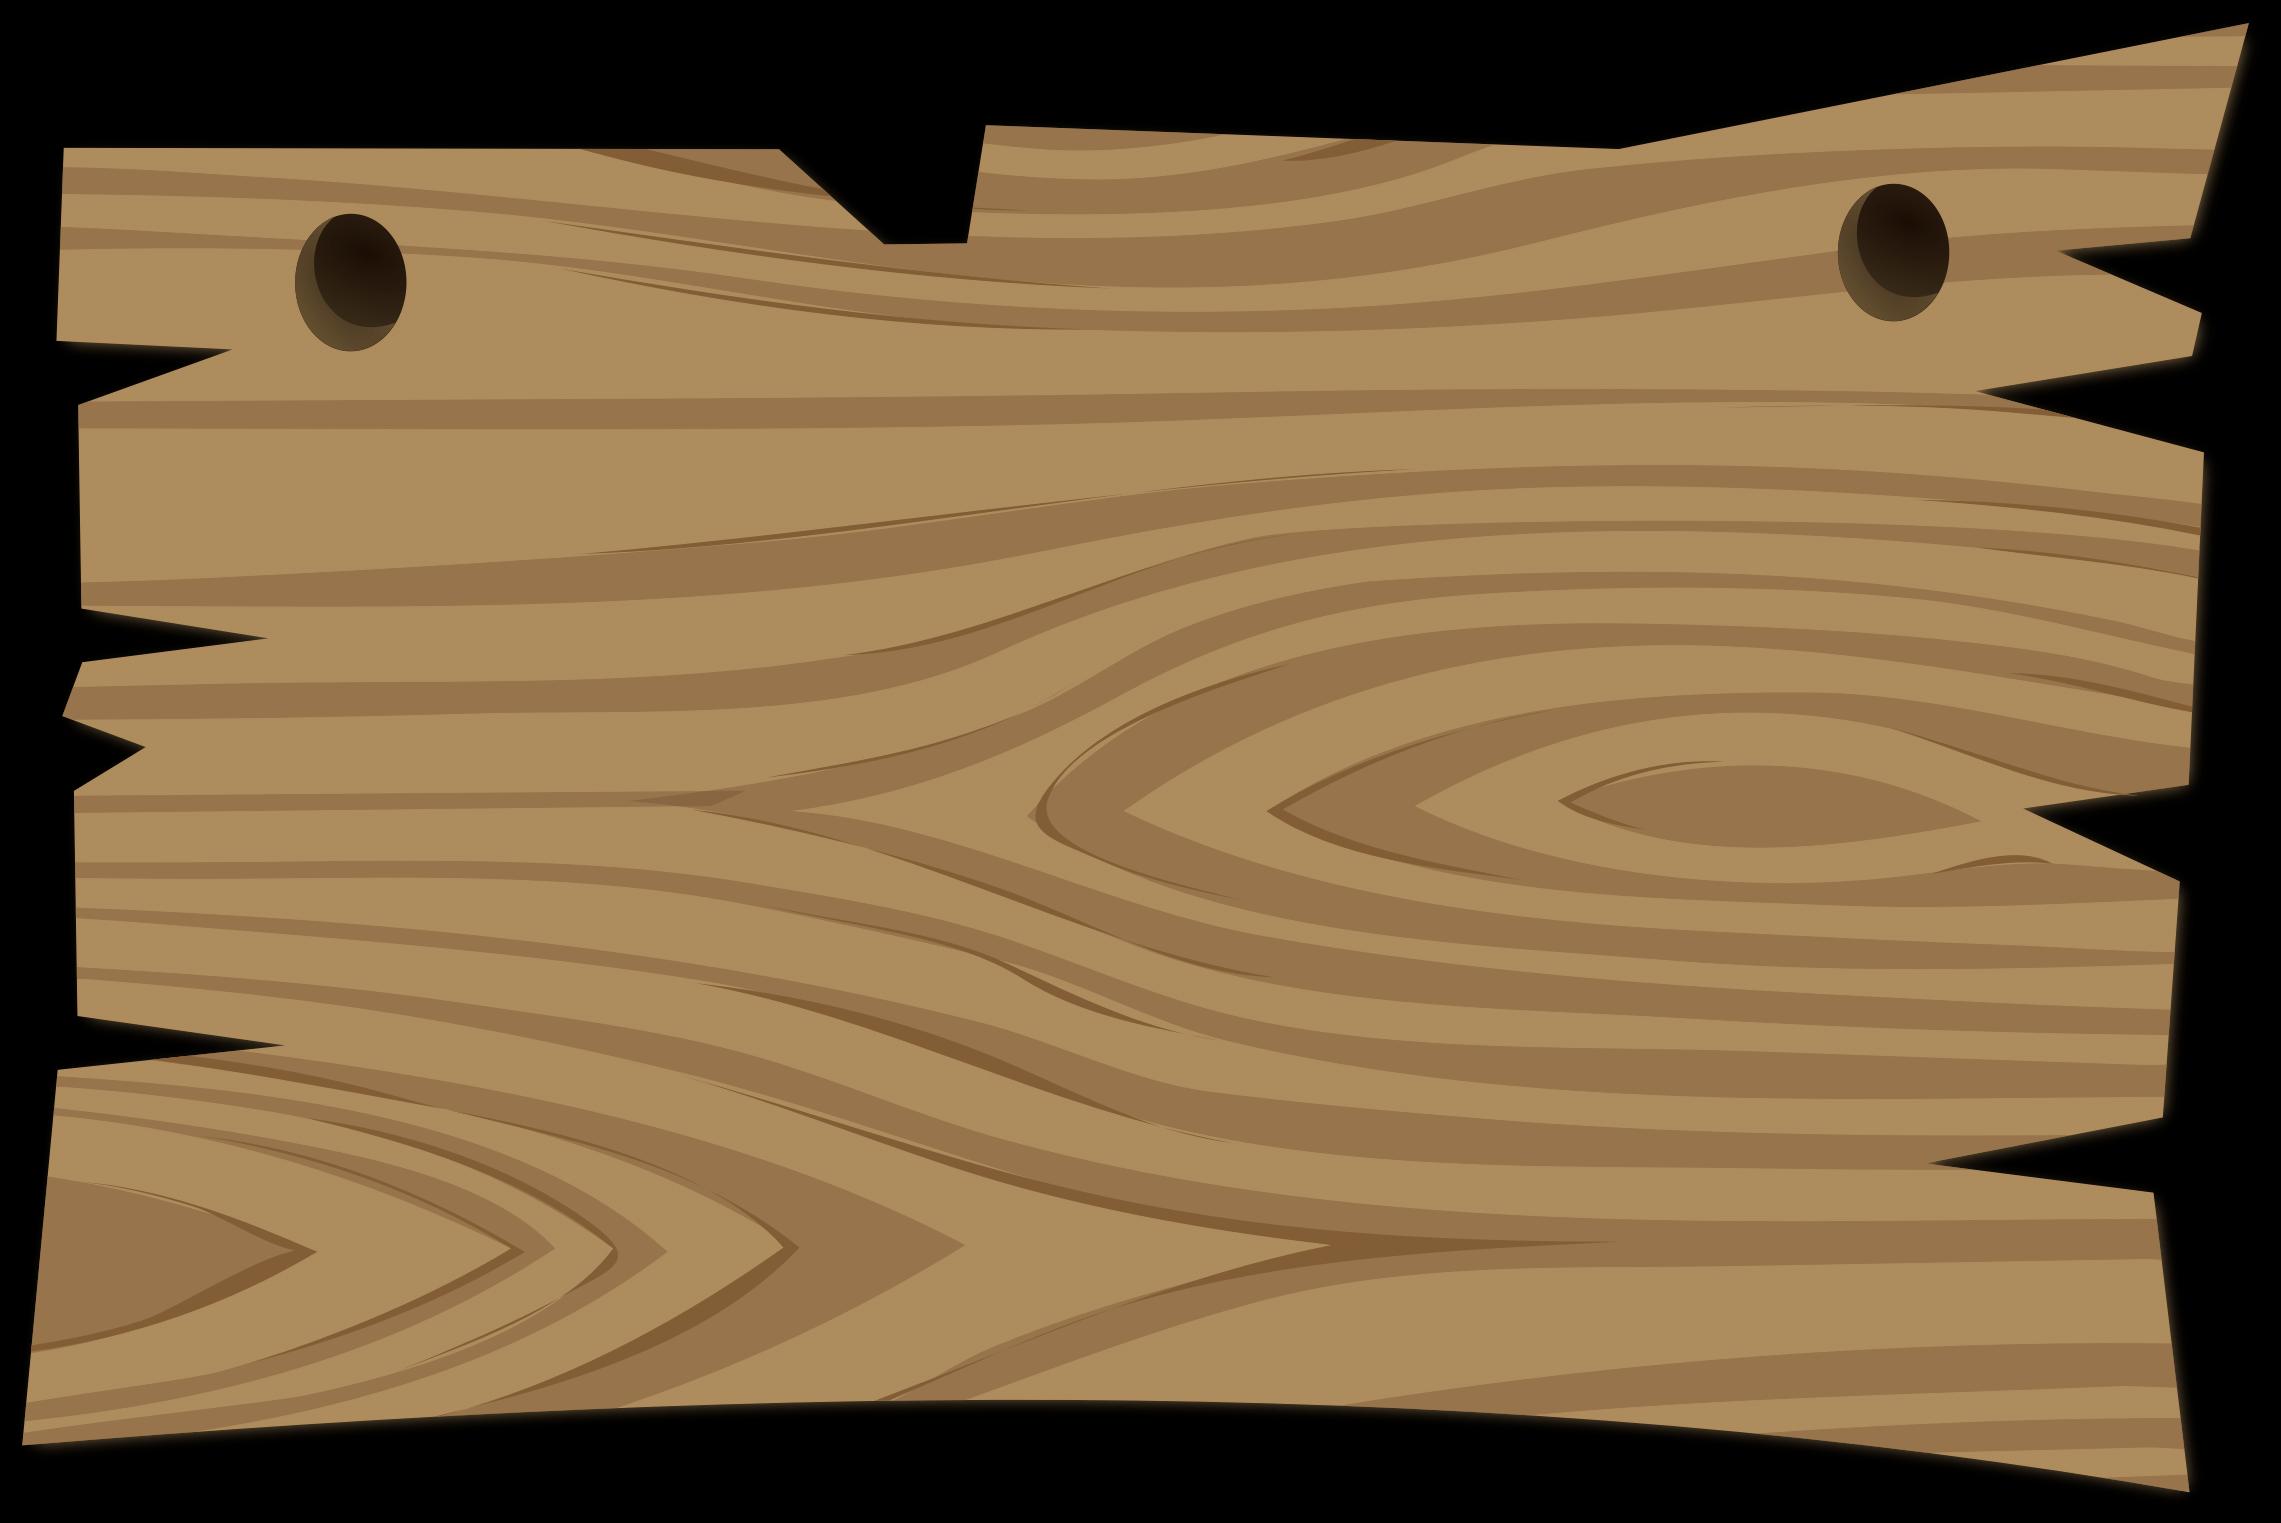 Free Deck Wood Cliparts, Download Free Clip Art, Free Clip.